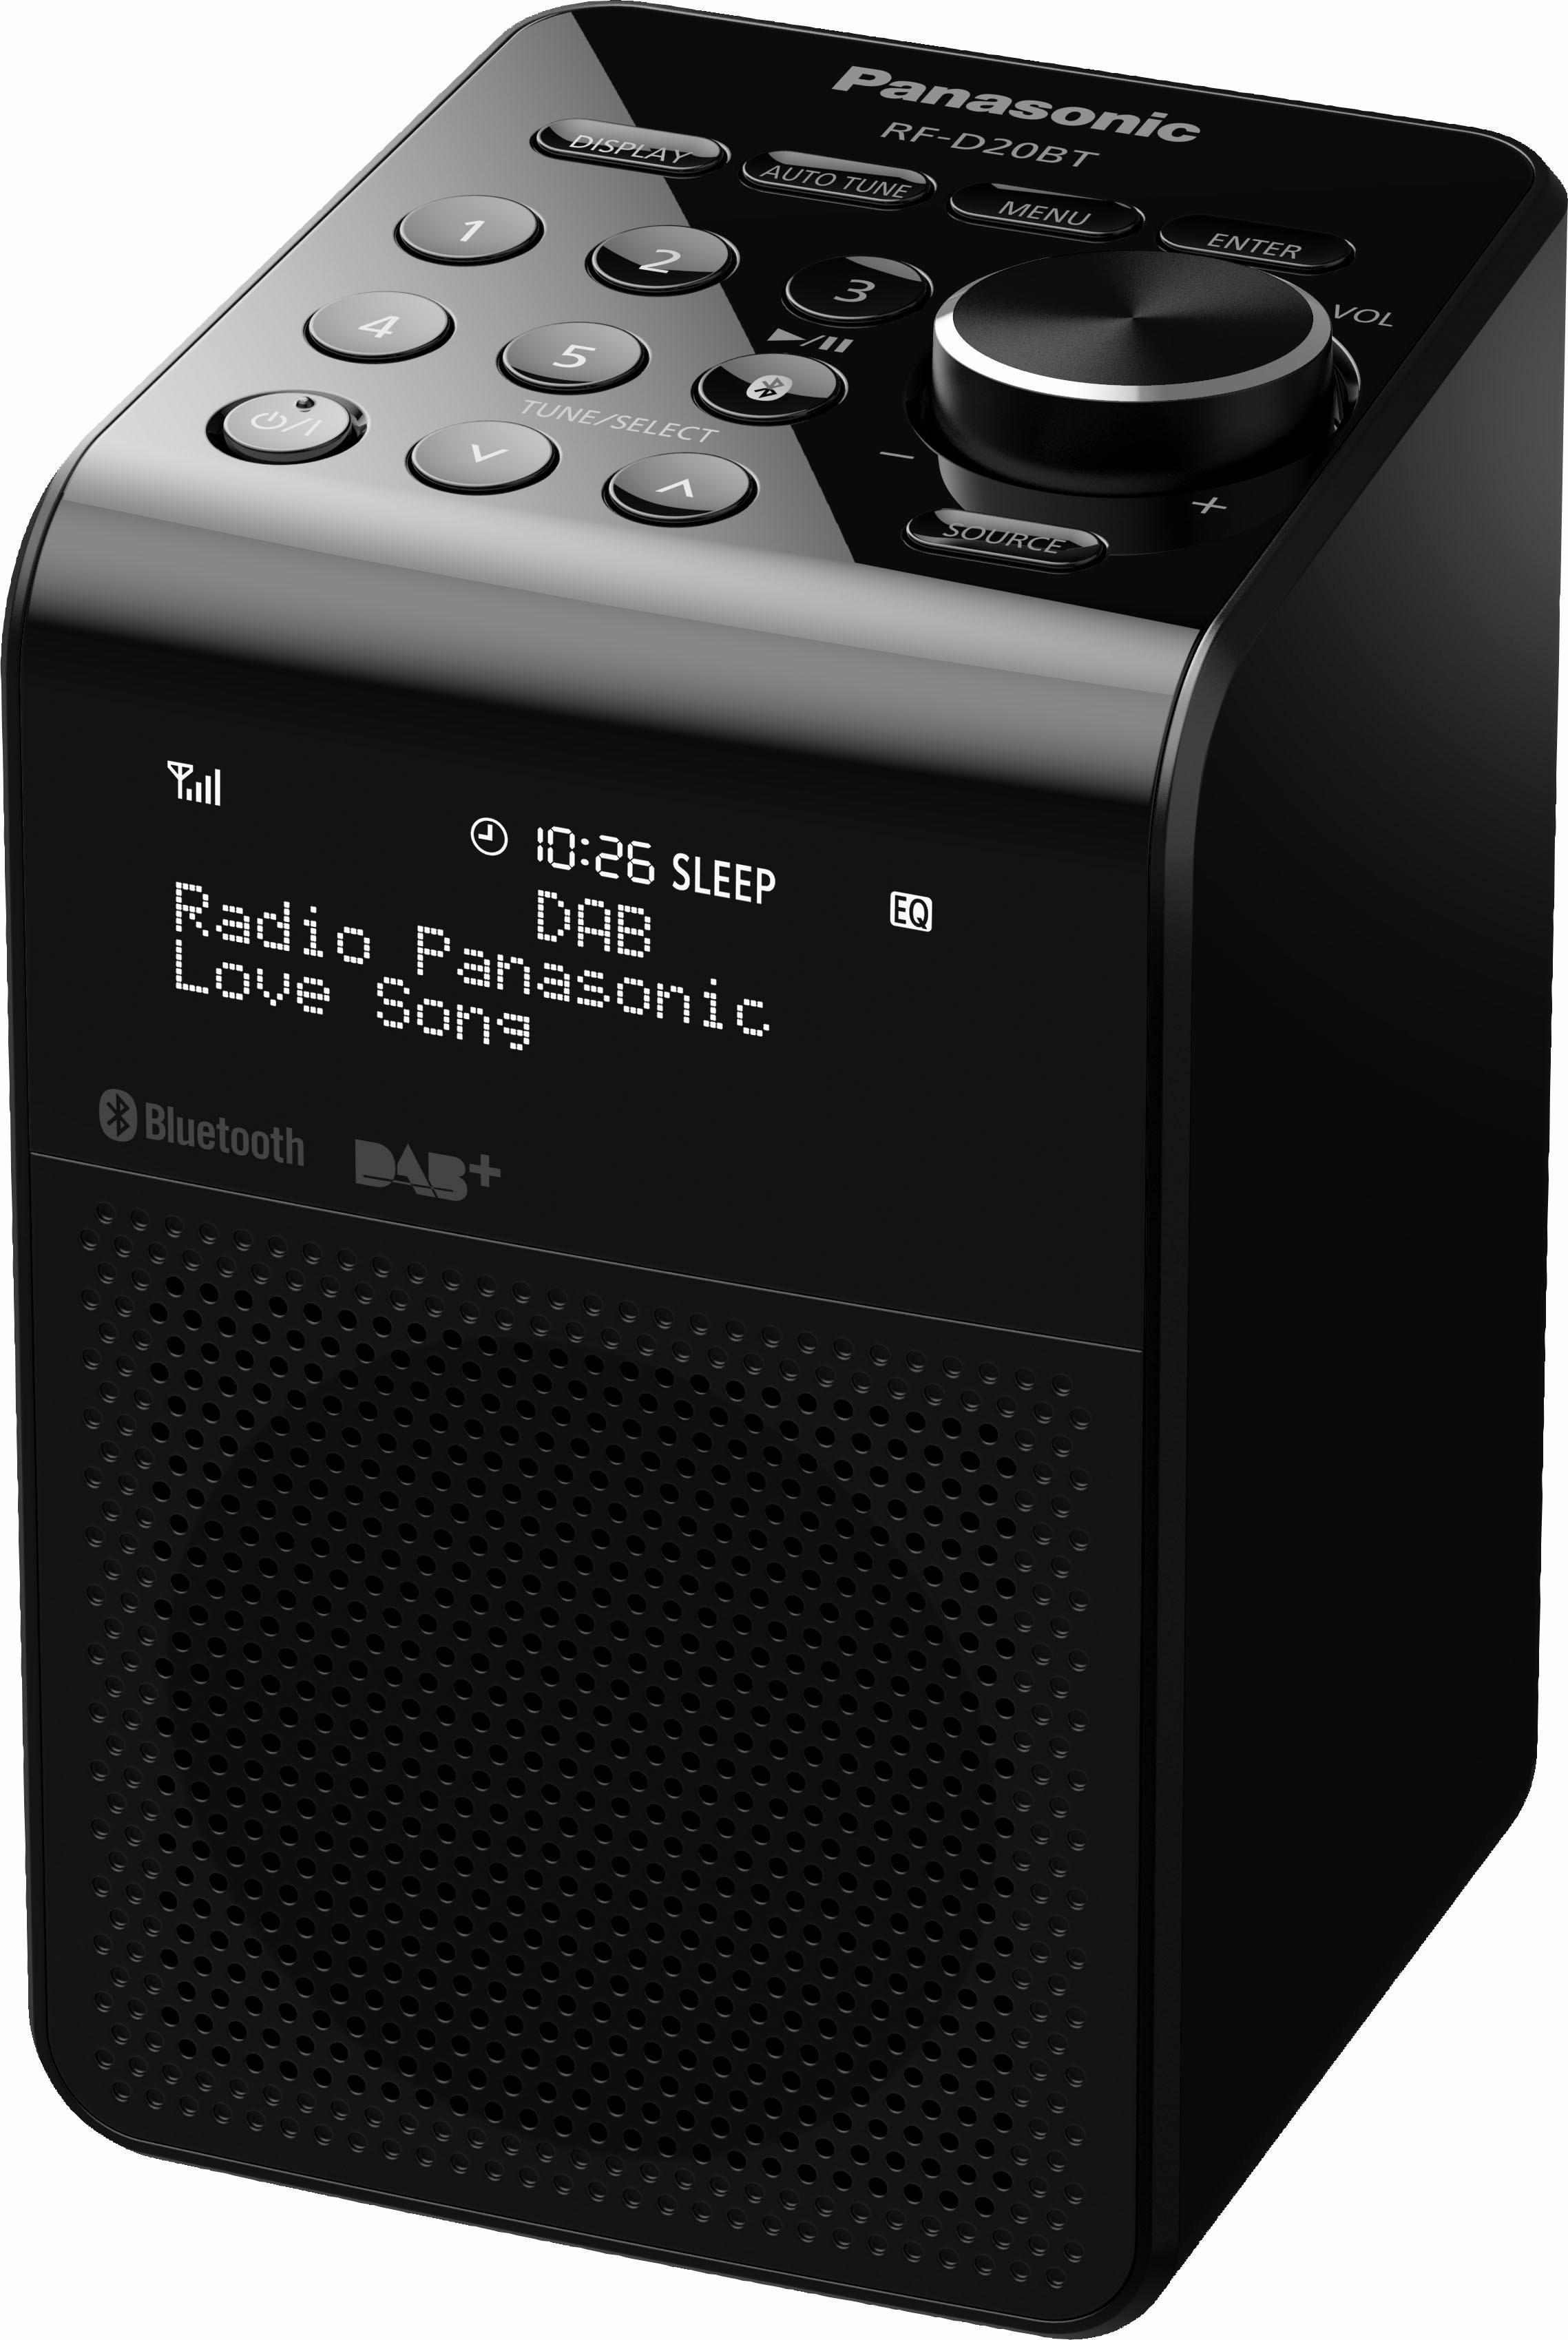 Panasonic »RF-D20BT« radio (bluetooth, digitale radio (DAB+), FM-tuner met RDS, 3 W) online kopen op otto.nl